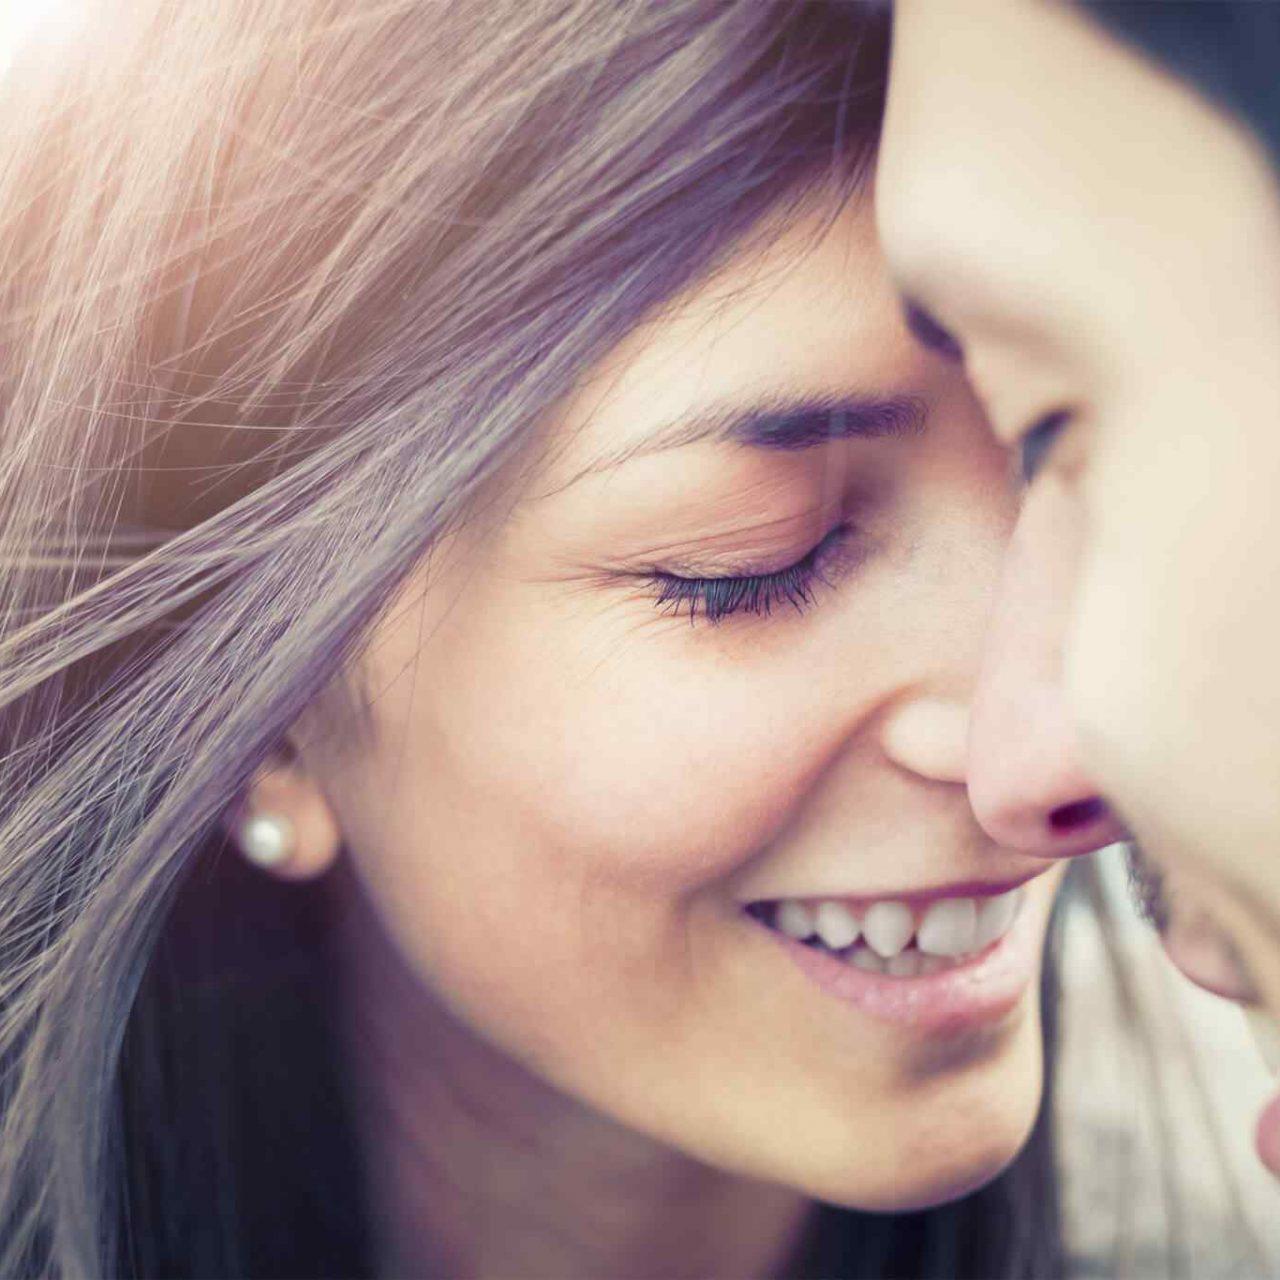 http://mirelasula.com/wp-content/uploads/2018/01/img-class-marriage-01-1280x1280.jpg